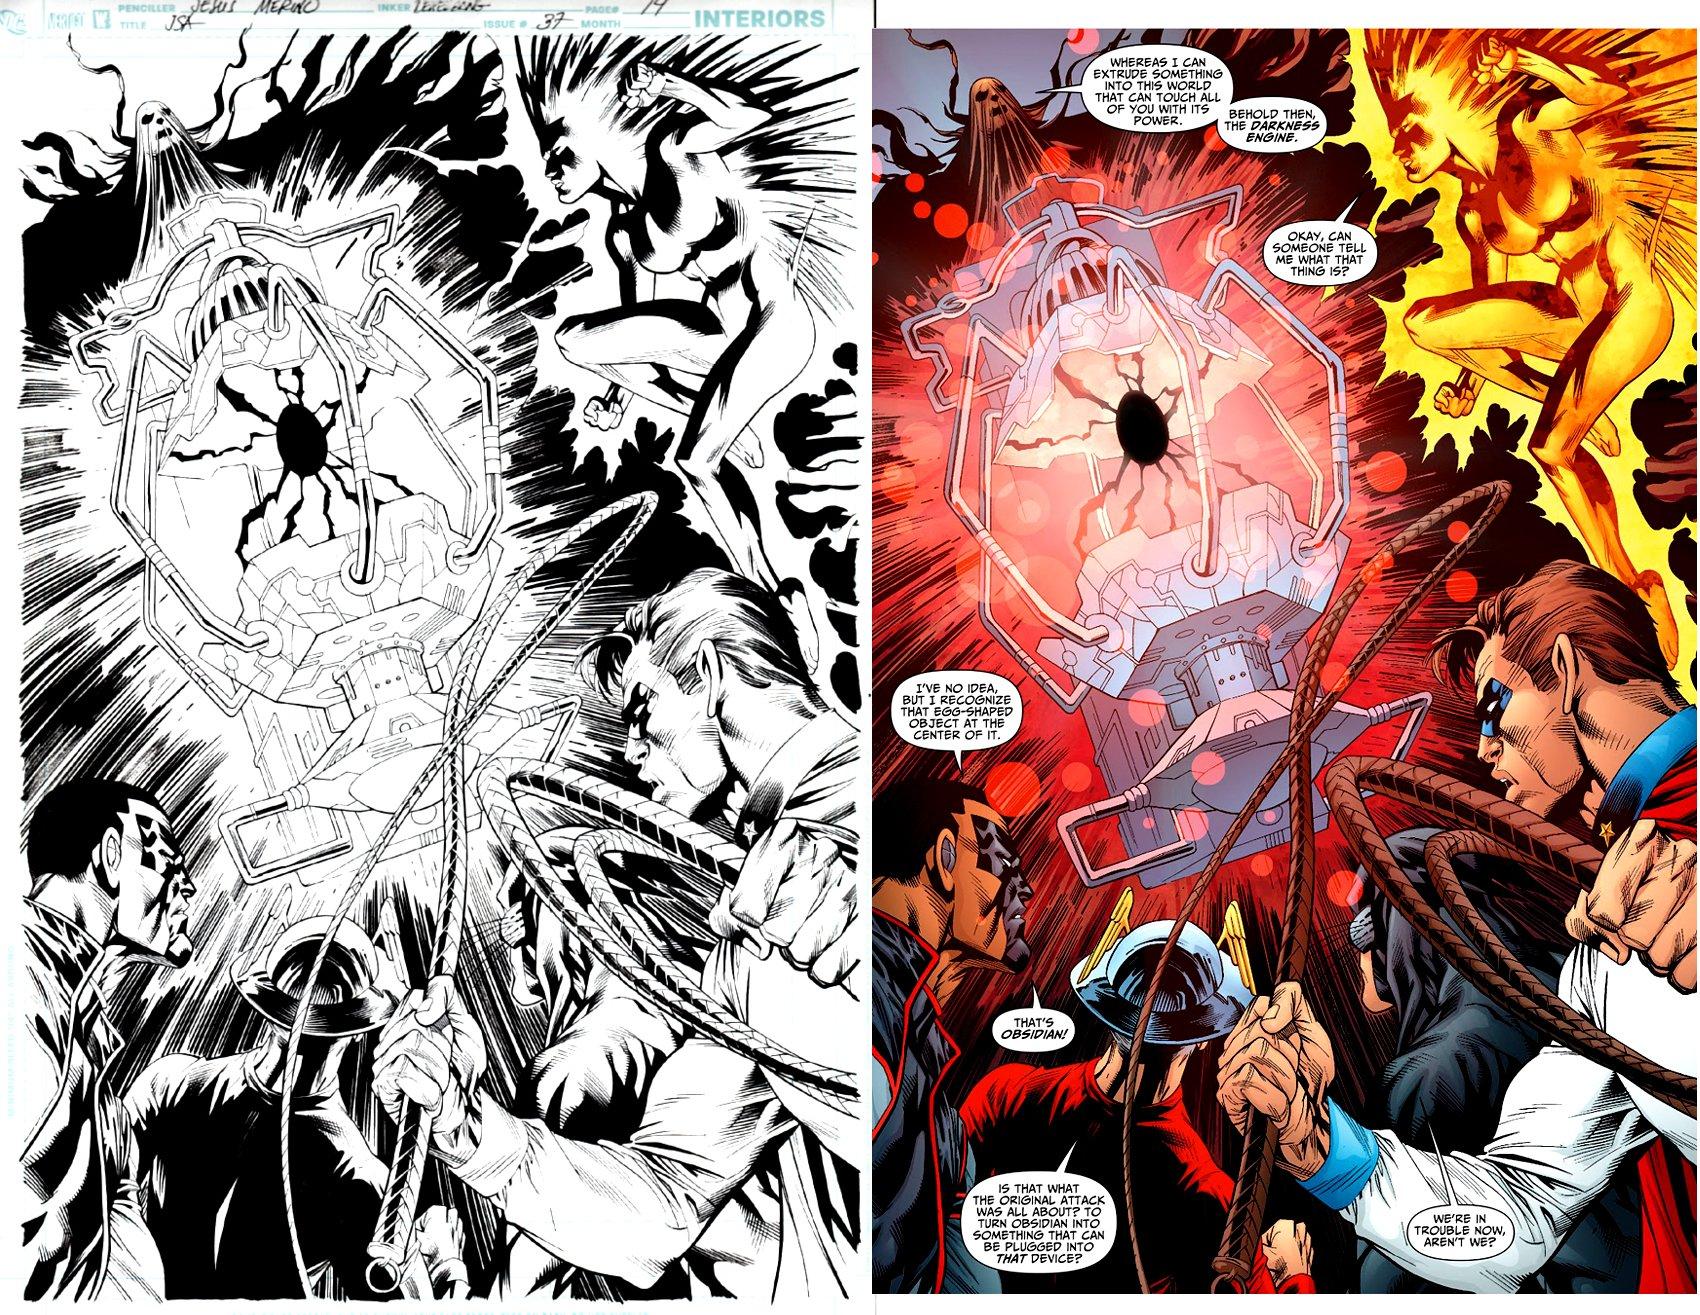 Justice Society of America #37 p 14 Splash (Mr. Terrific; Golden age Flash, Mr. America, Wildcat, Lightning) 2010